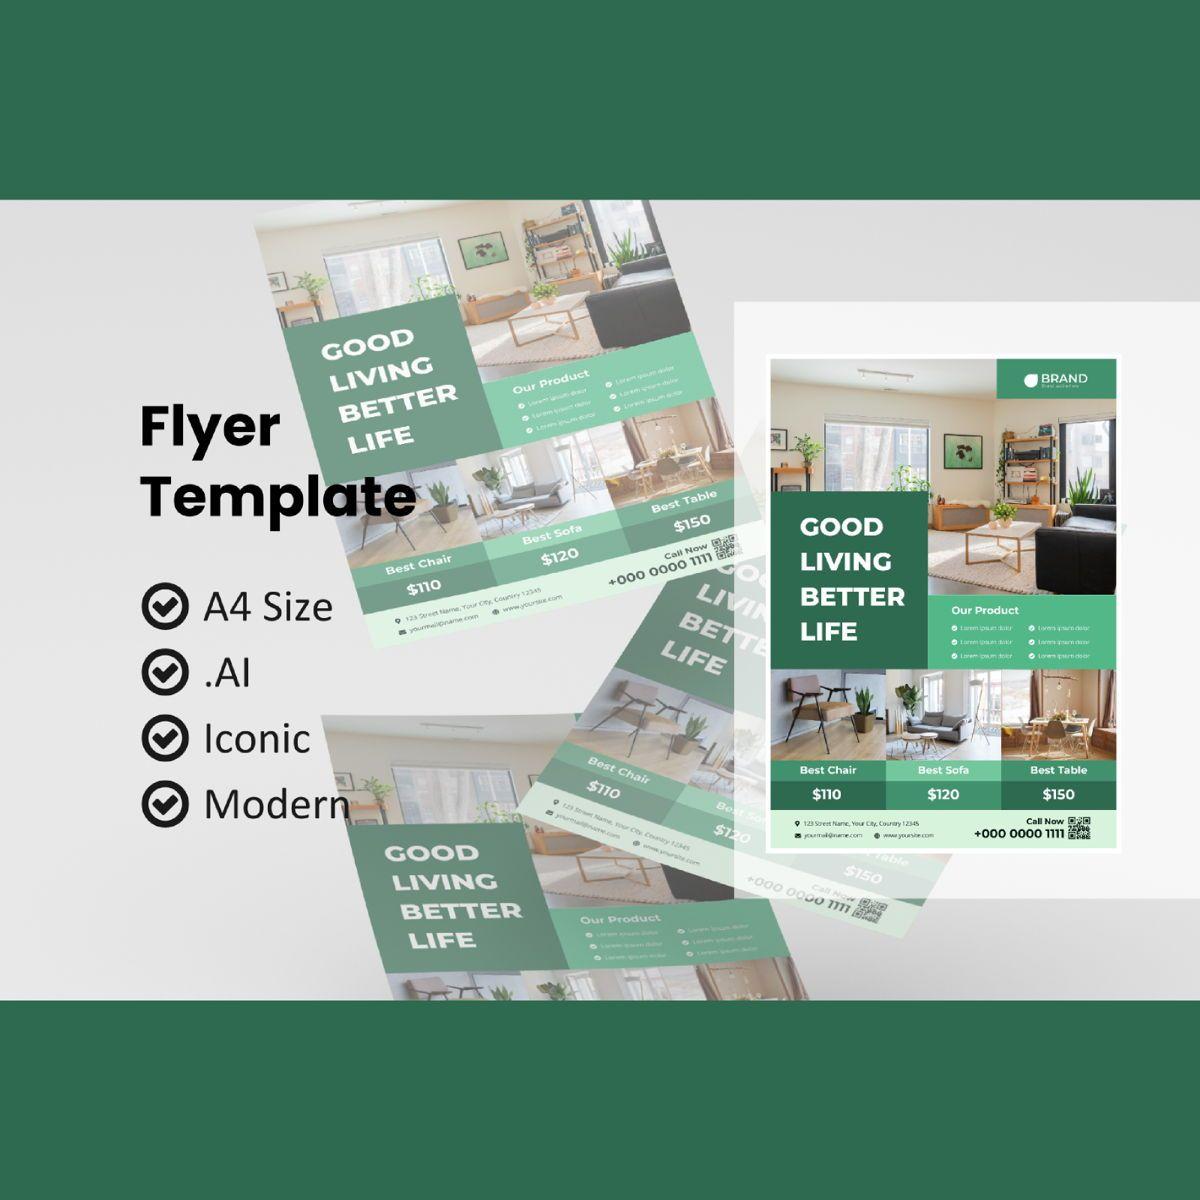 Business furniture flyer template, 08988, Utilities/Industrial — PoweredTemplate.com